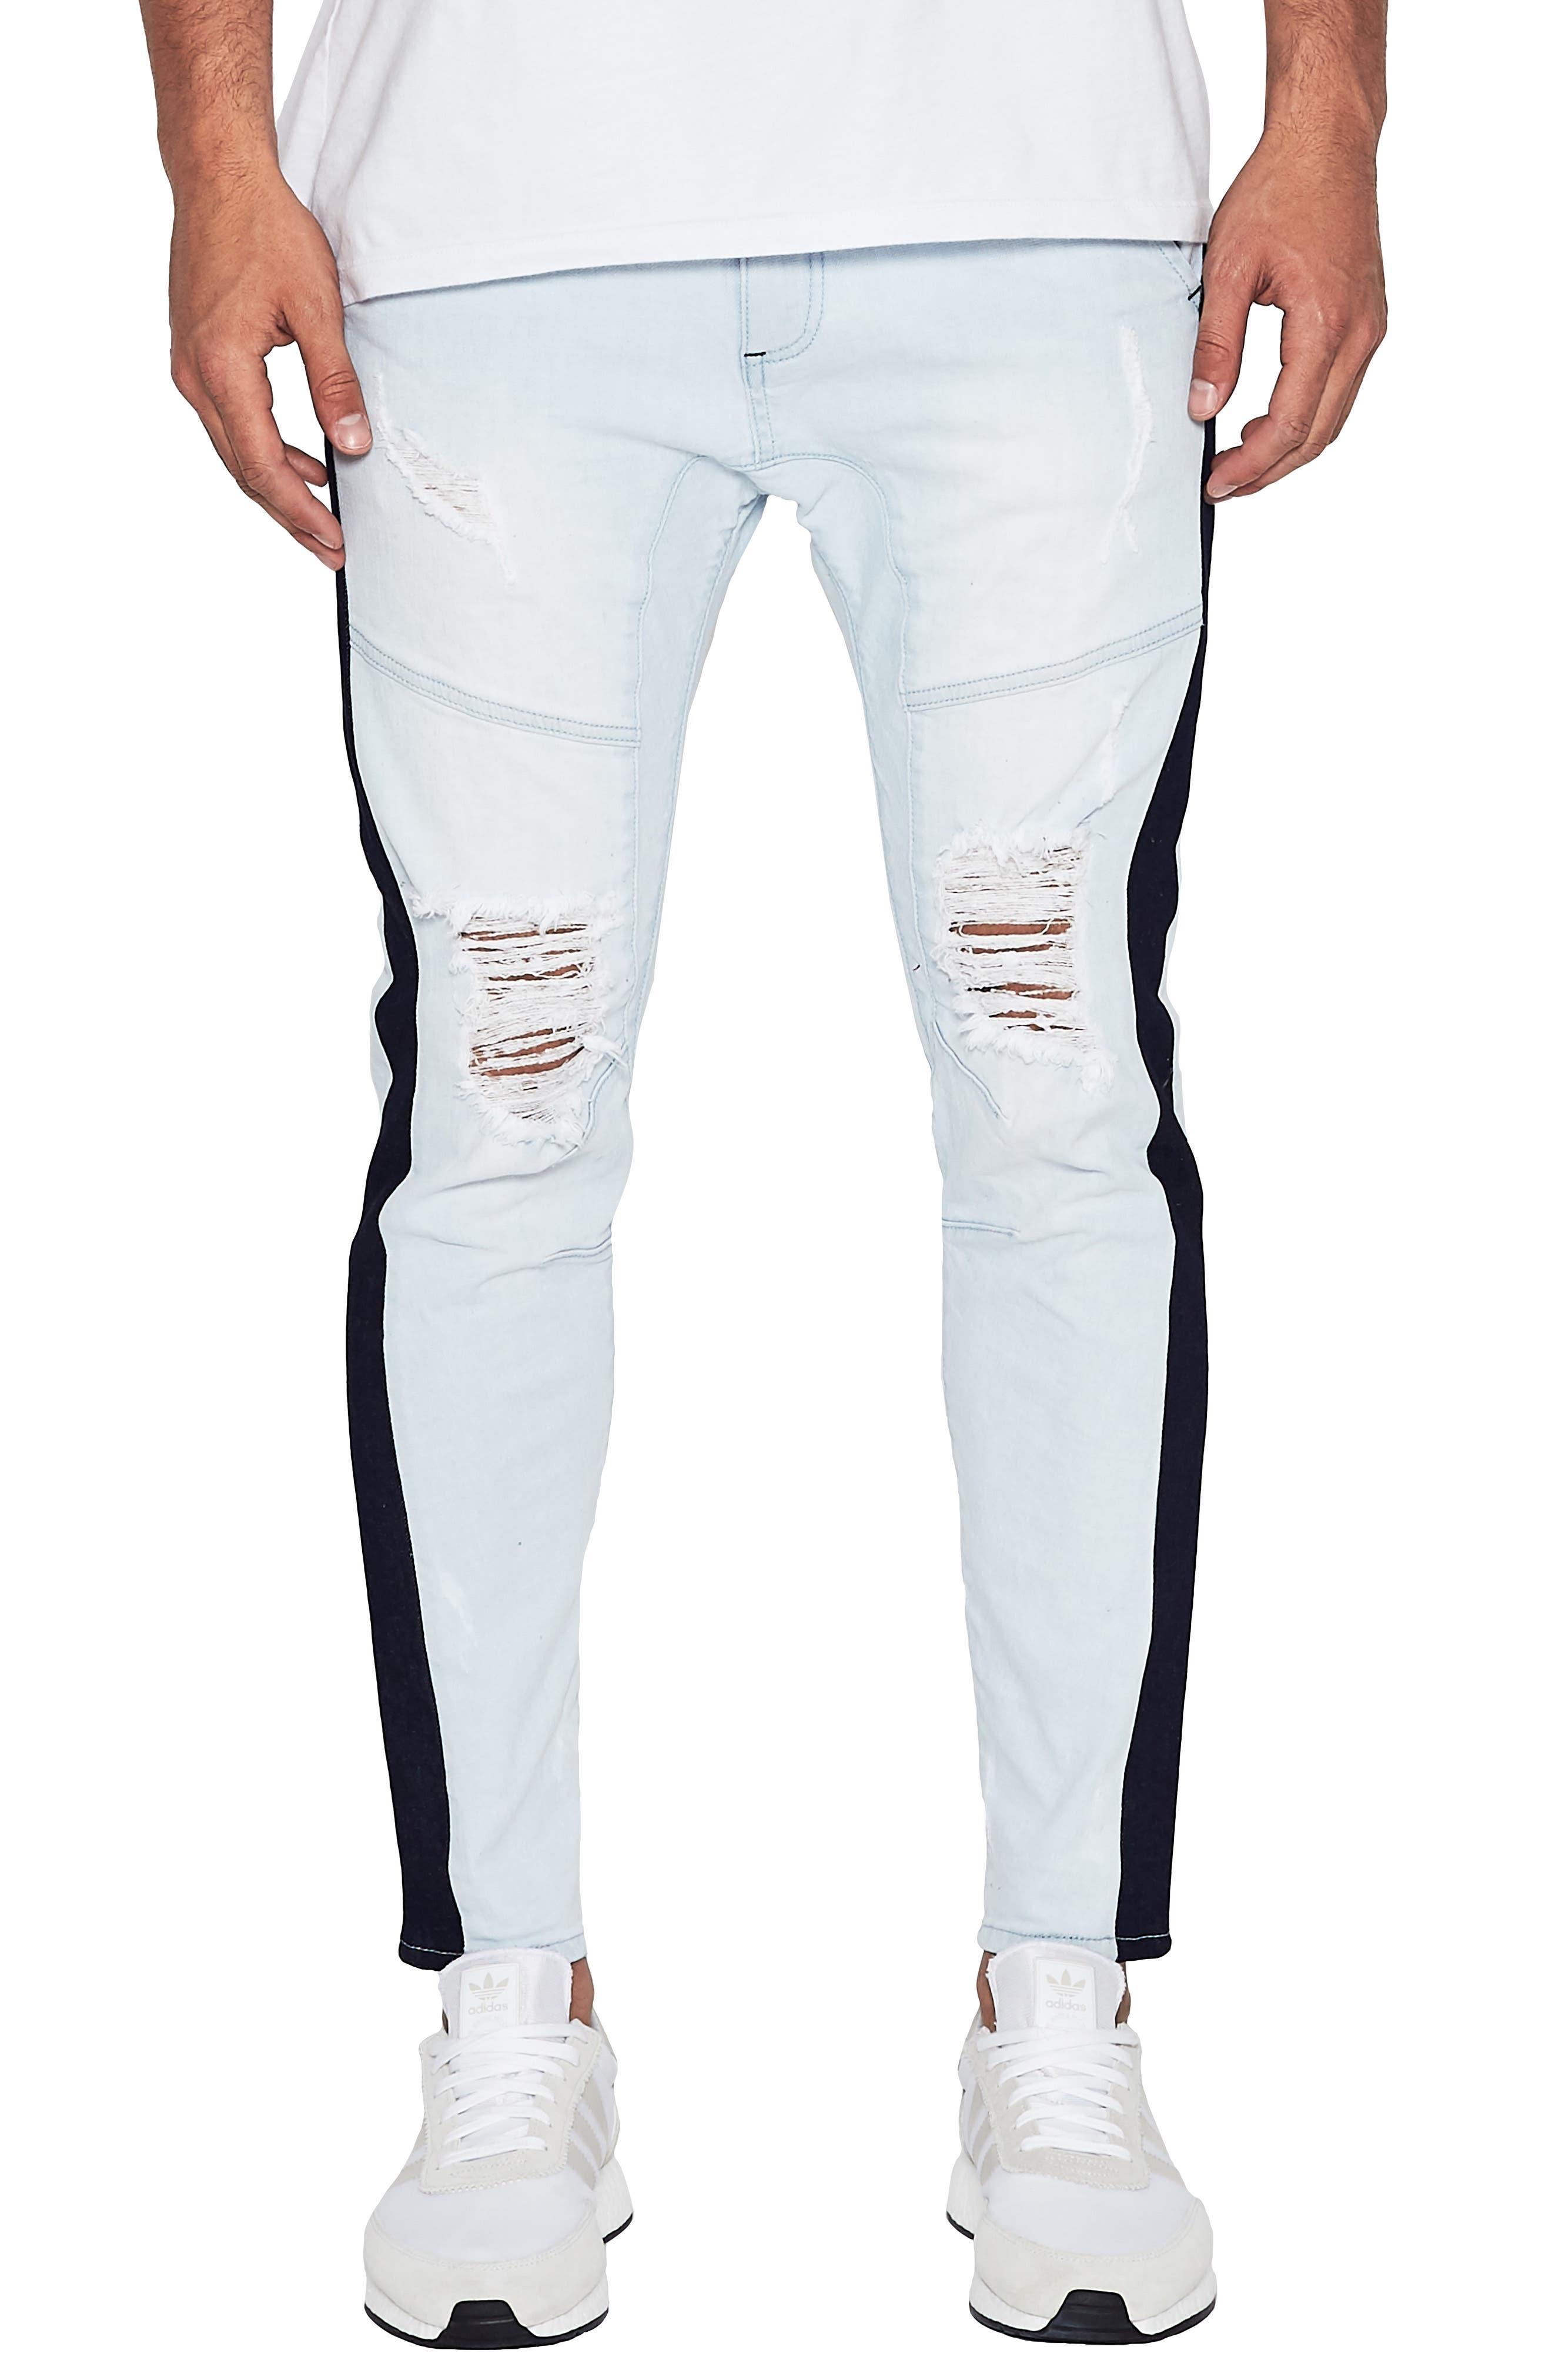 NXP Sergeant Slim Fit Jeans in Broken Bleach